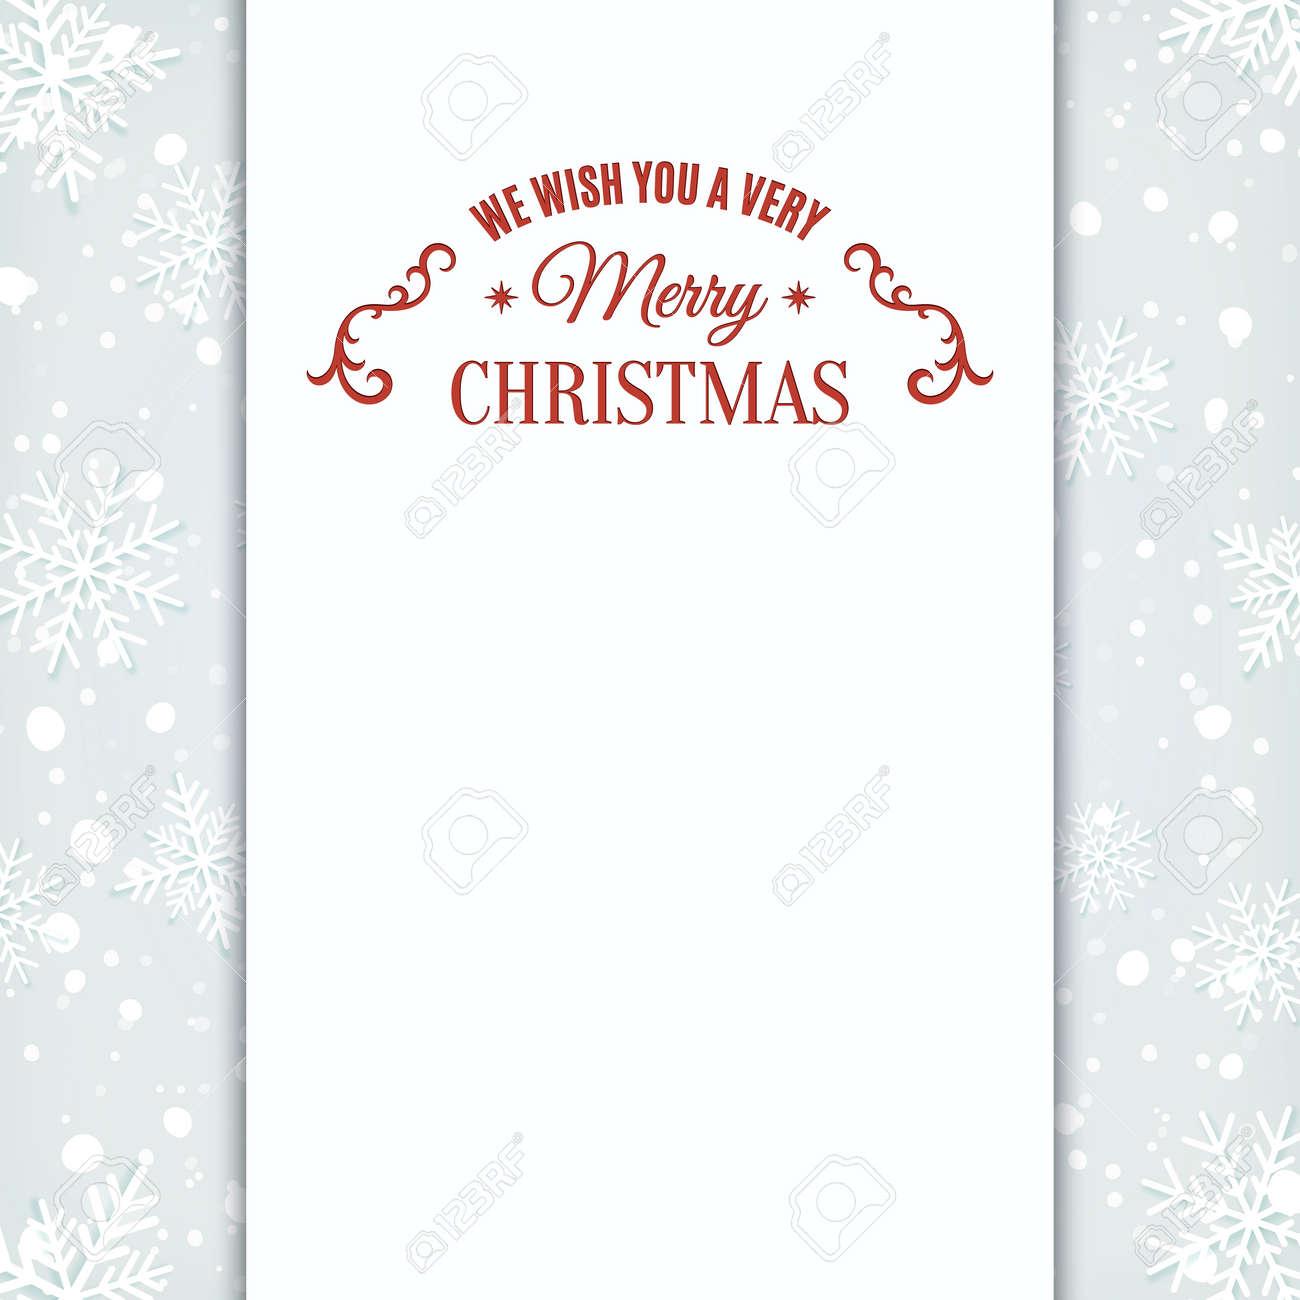 free snowflake invitation template